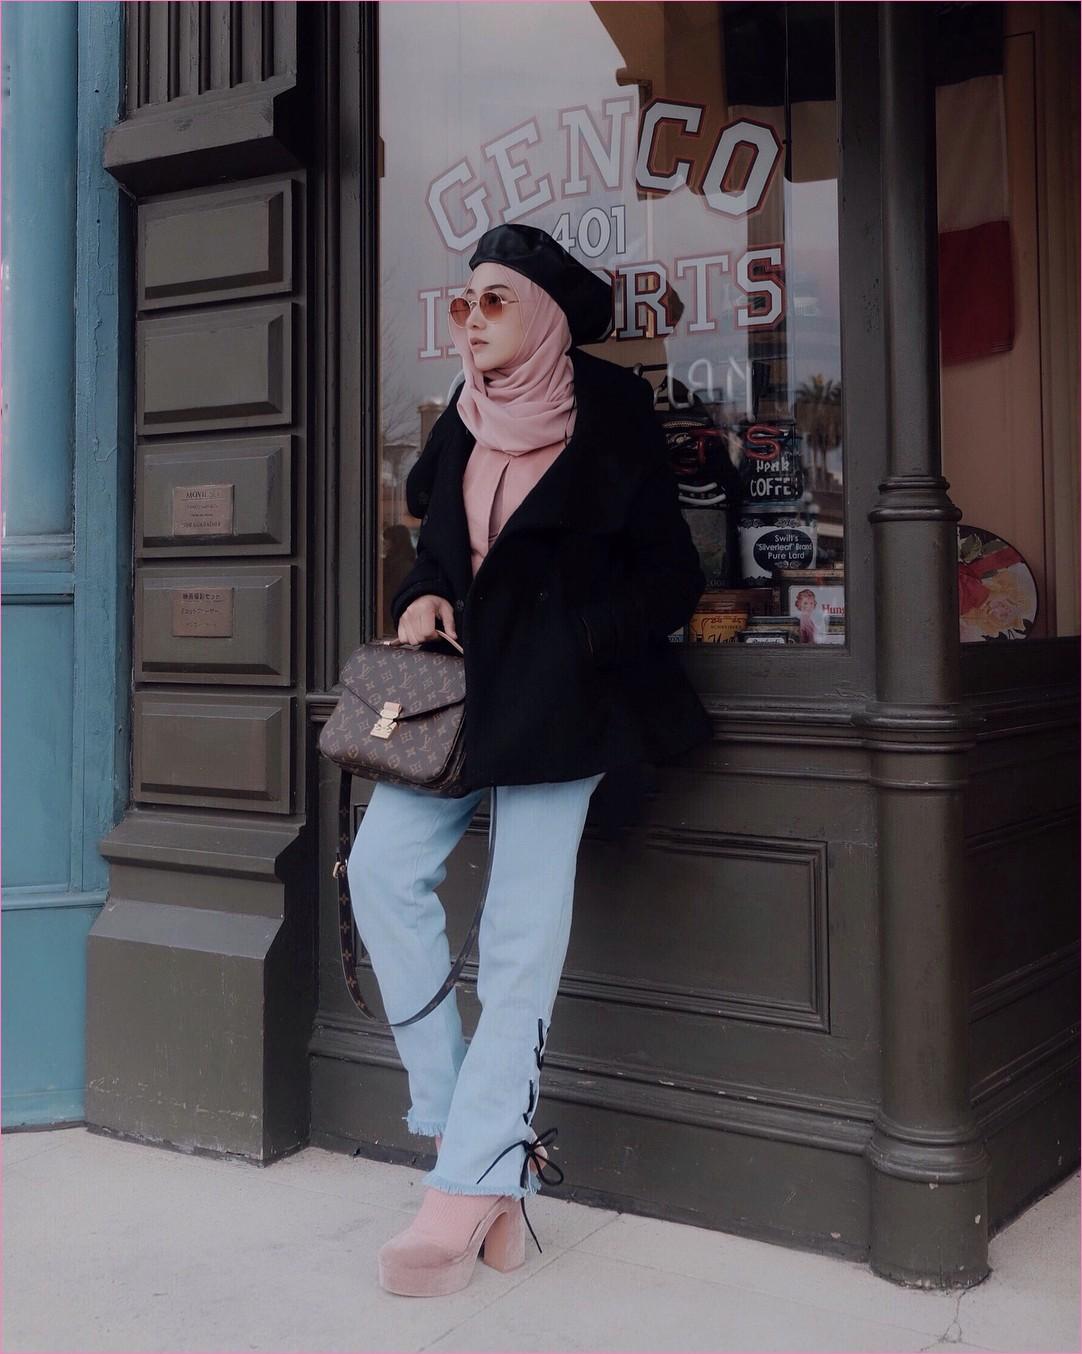 Outfit Baju Traveler Berhijab untuk Keluar Negri Ala Selebgram 2018 blezer bulu jacket topi hitam tote bags coklat tua jeans denim biru muda  high heels wedges kaos kaki pashmina diamond blouse kemeja kacamata ootd outfit coat